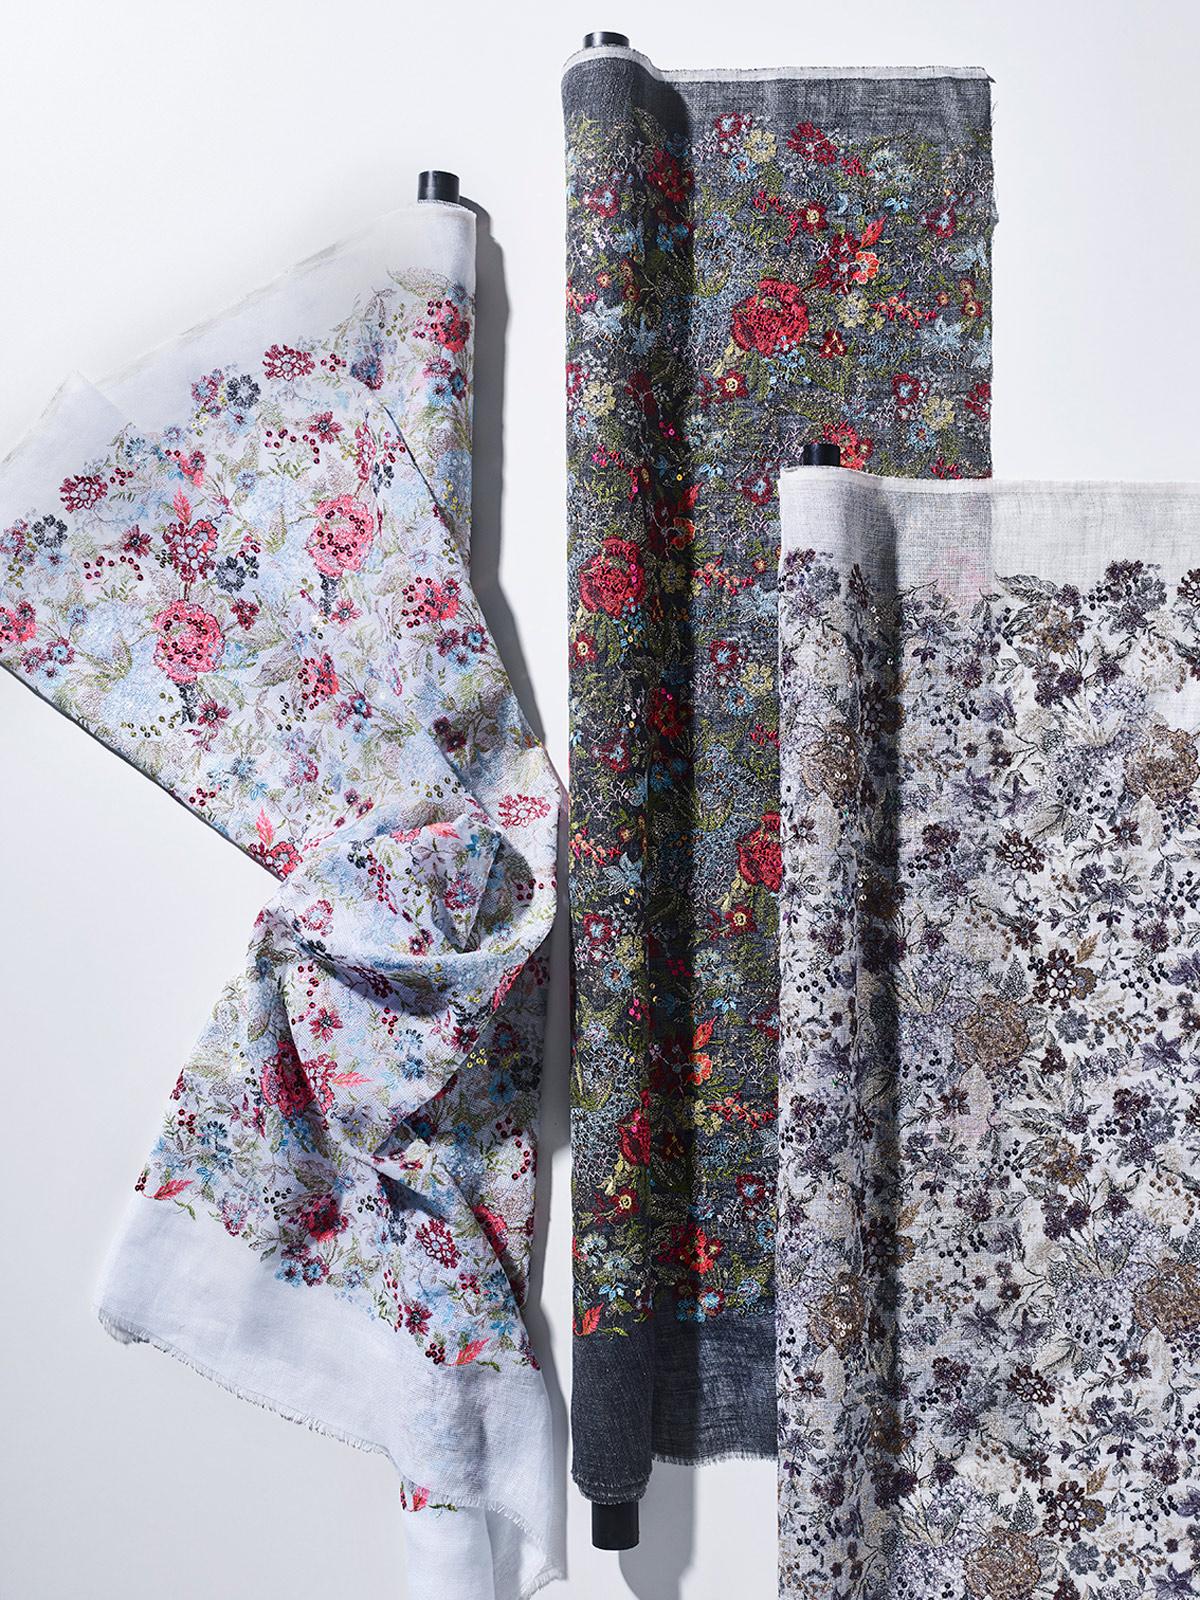 bernhard duss-jakob schlaepfer-colours-textiledesign-fabrics-designer-custom made fabrics-embroidery-embroidery on linen